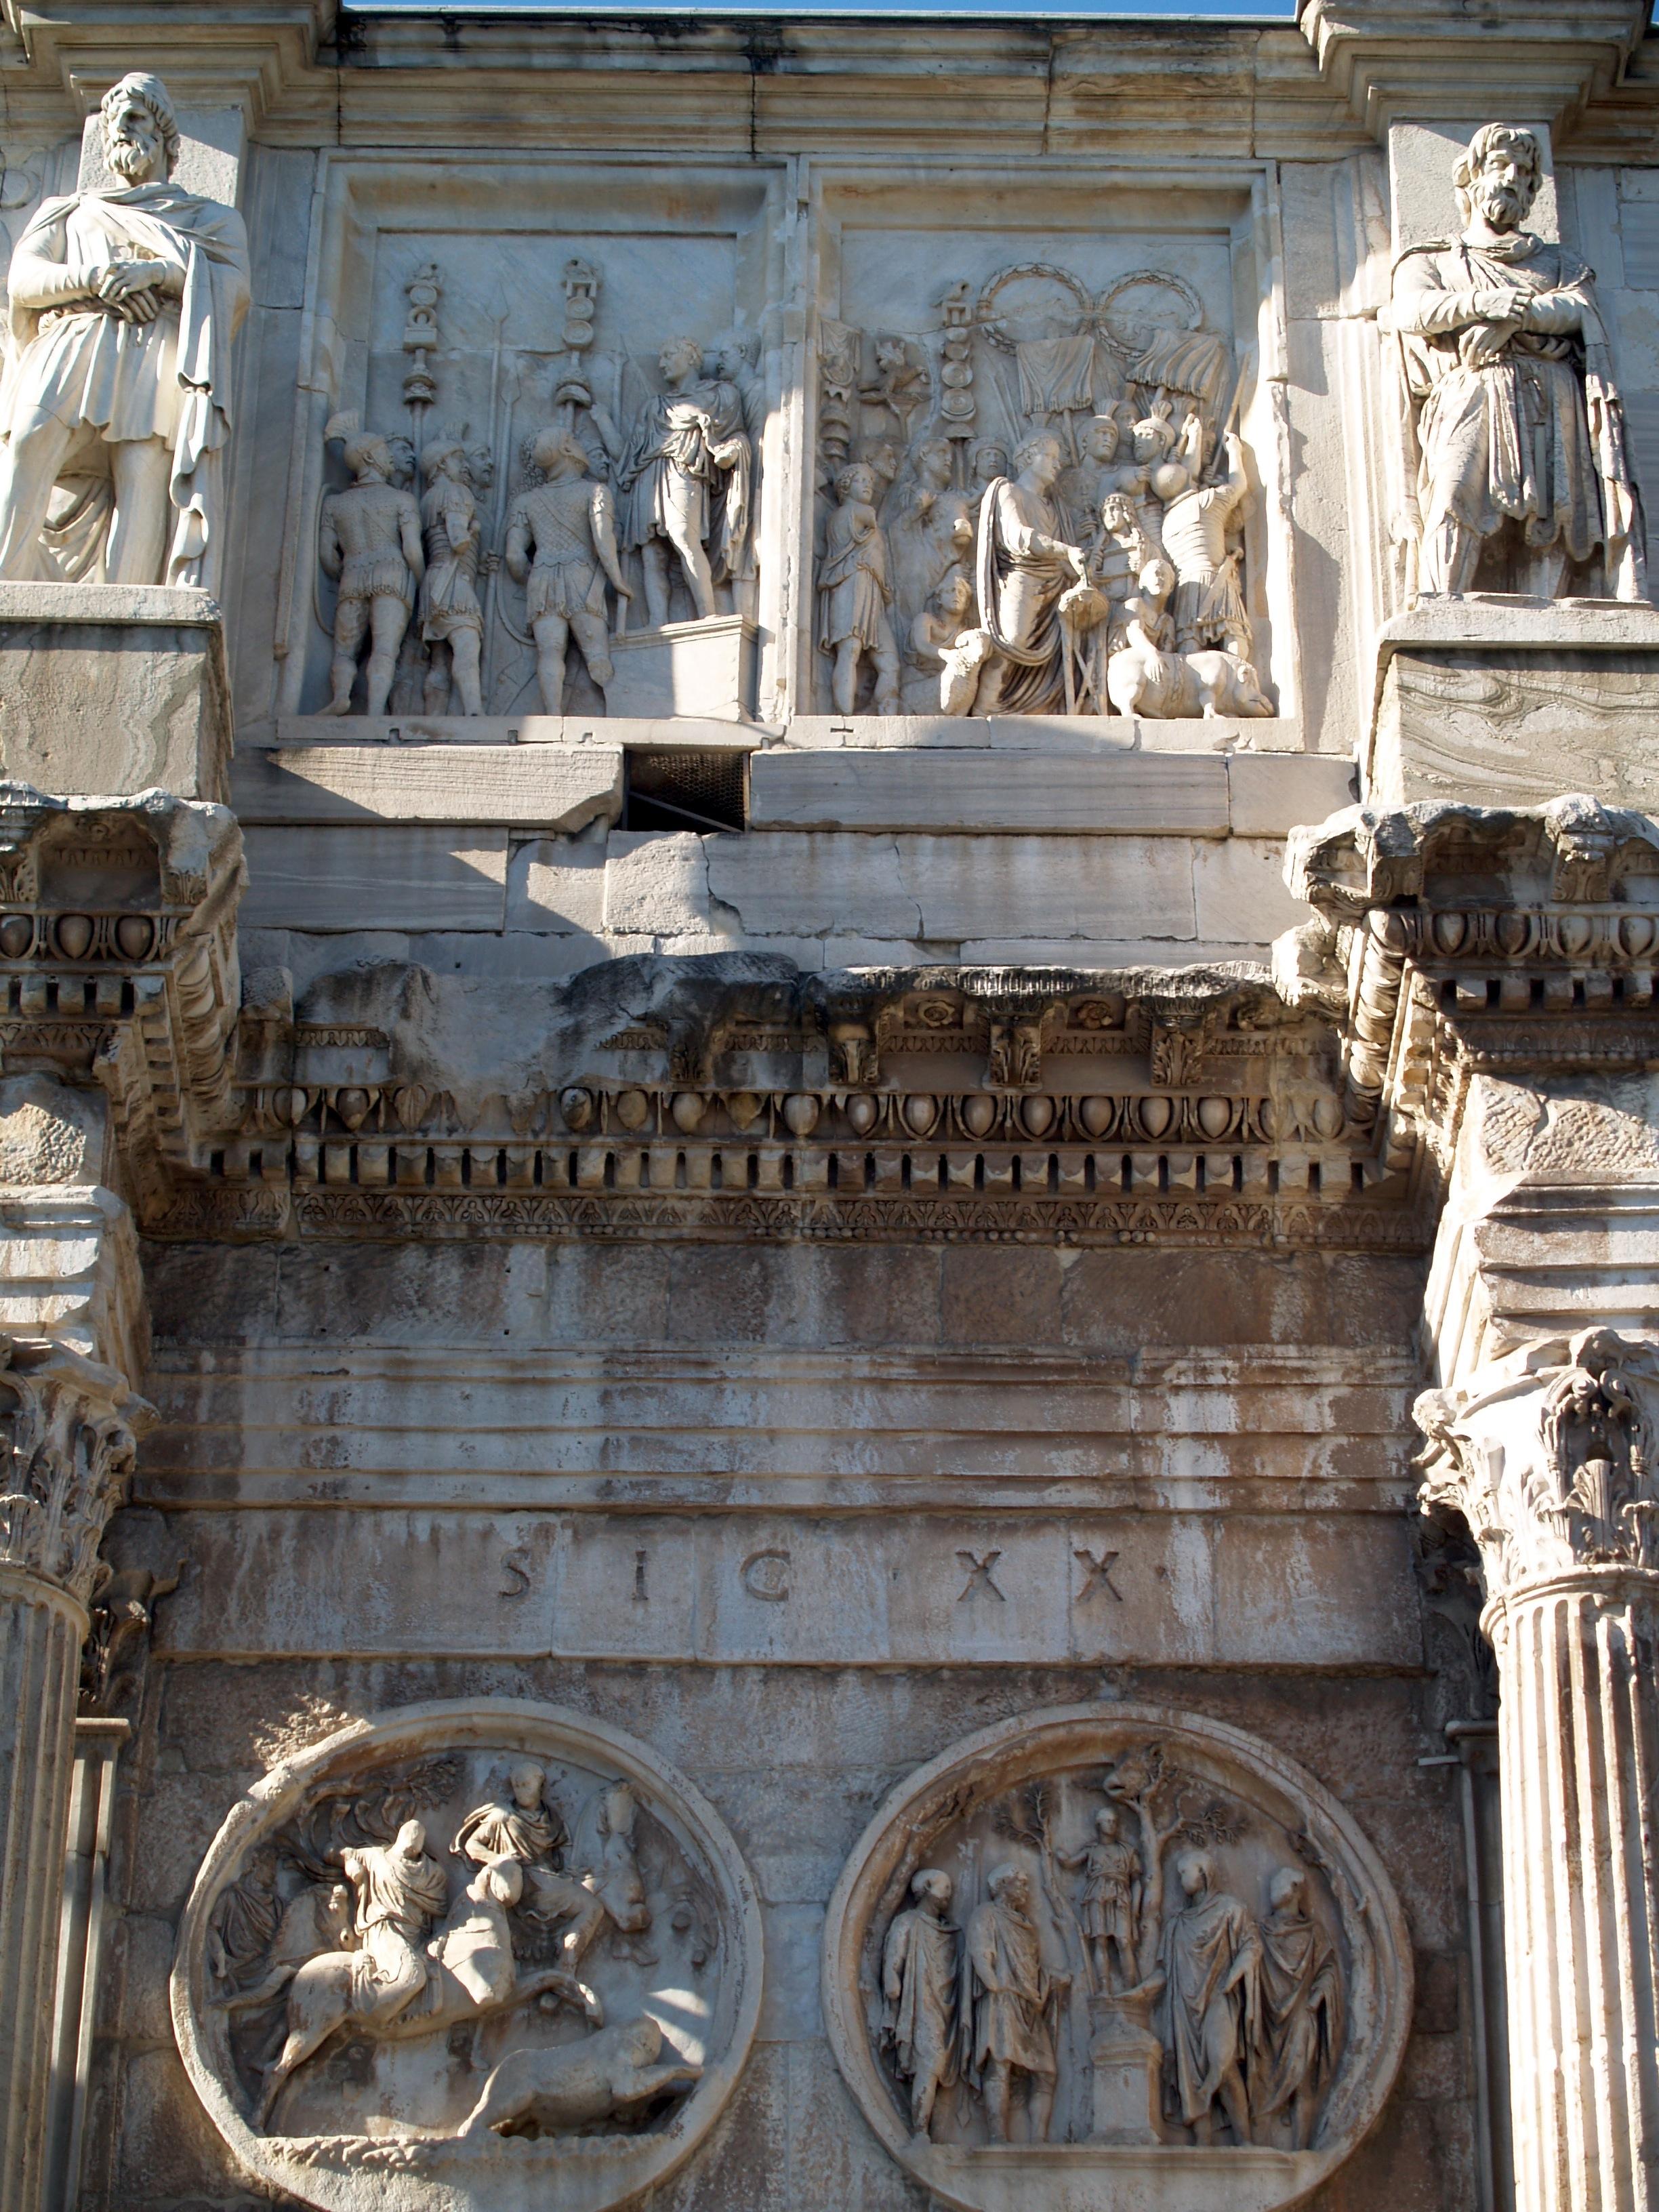 File:Arco de Constantino, relieves de Marco Aurelio..JPG - Wikimedia ...